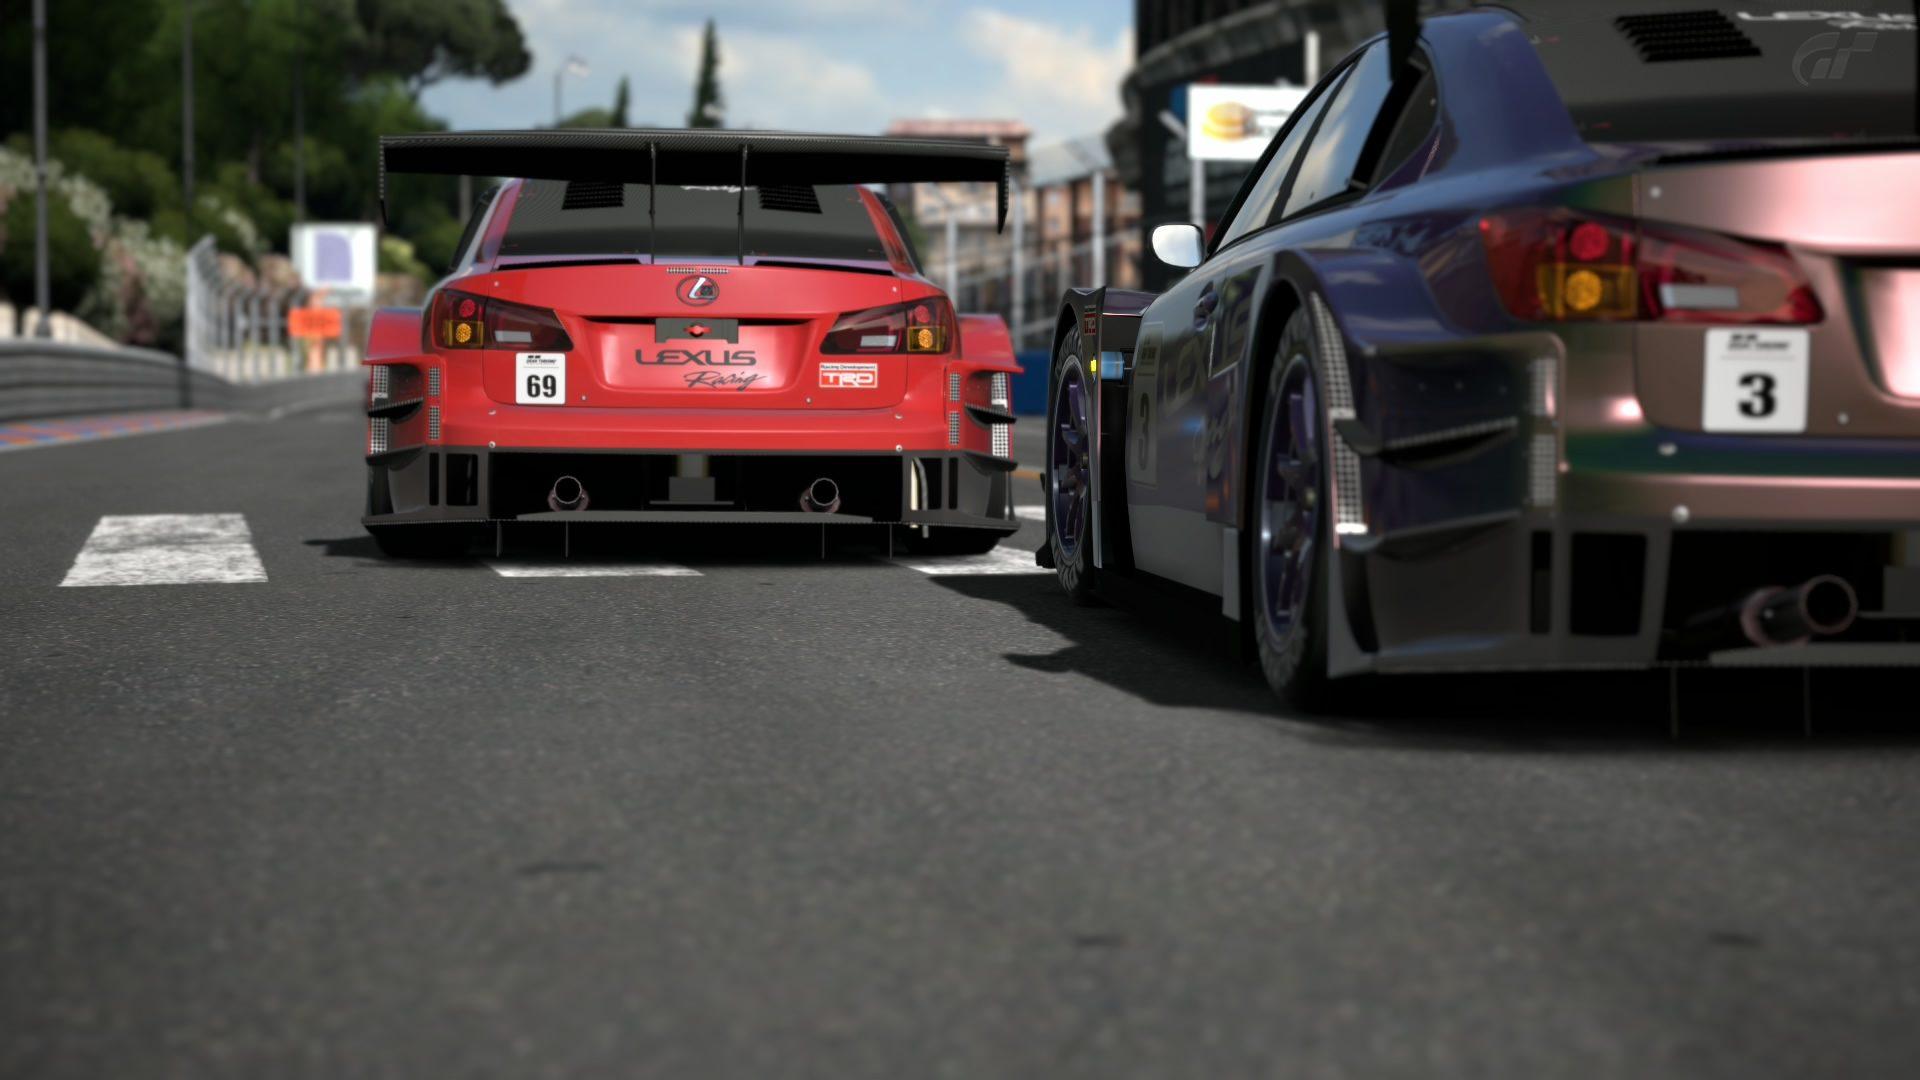 Circuito di Roma_15.jpg